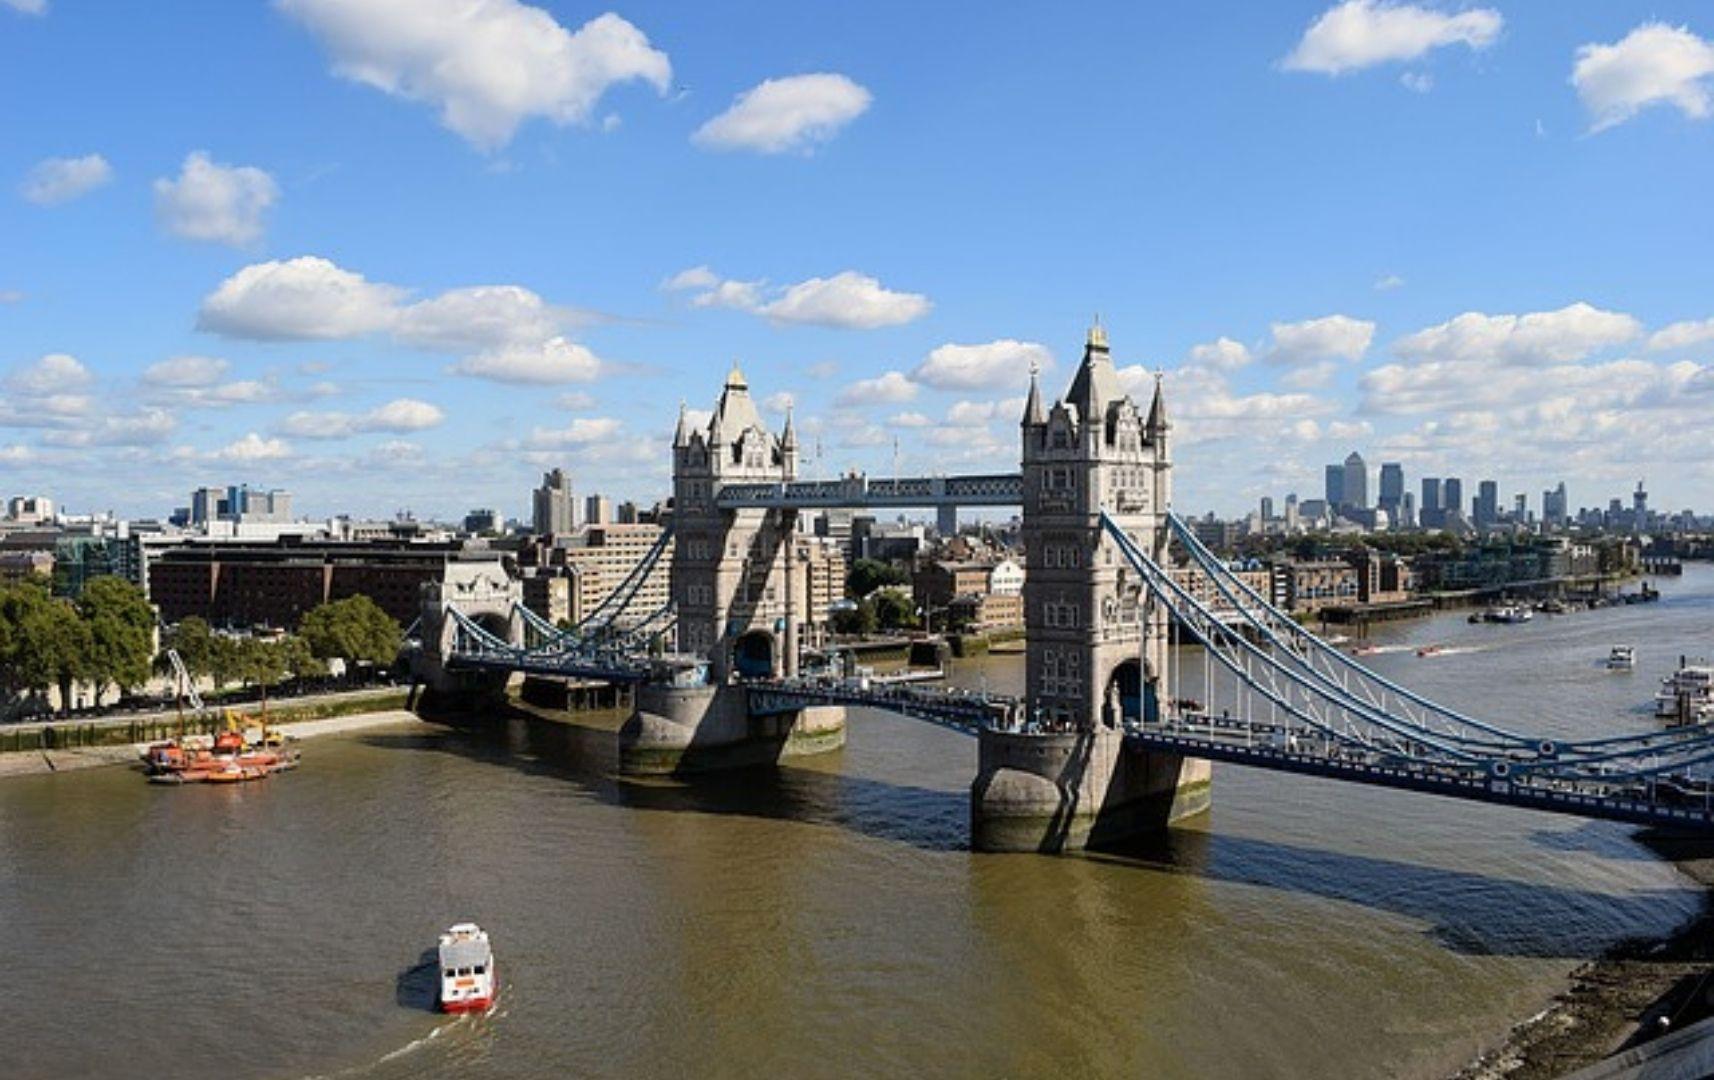 Reisebericht London Towerbridge